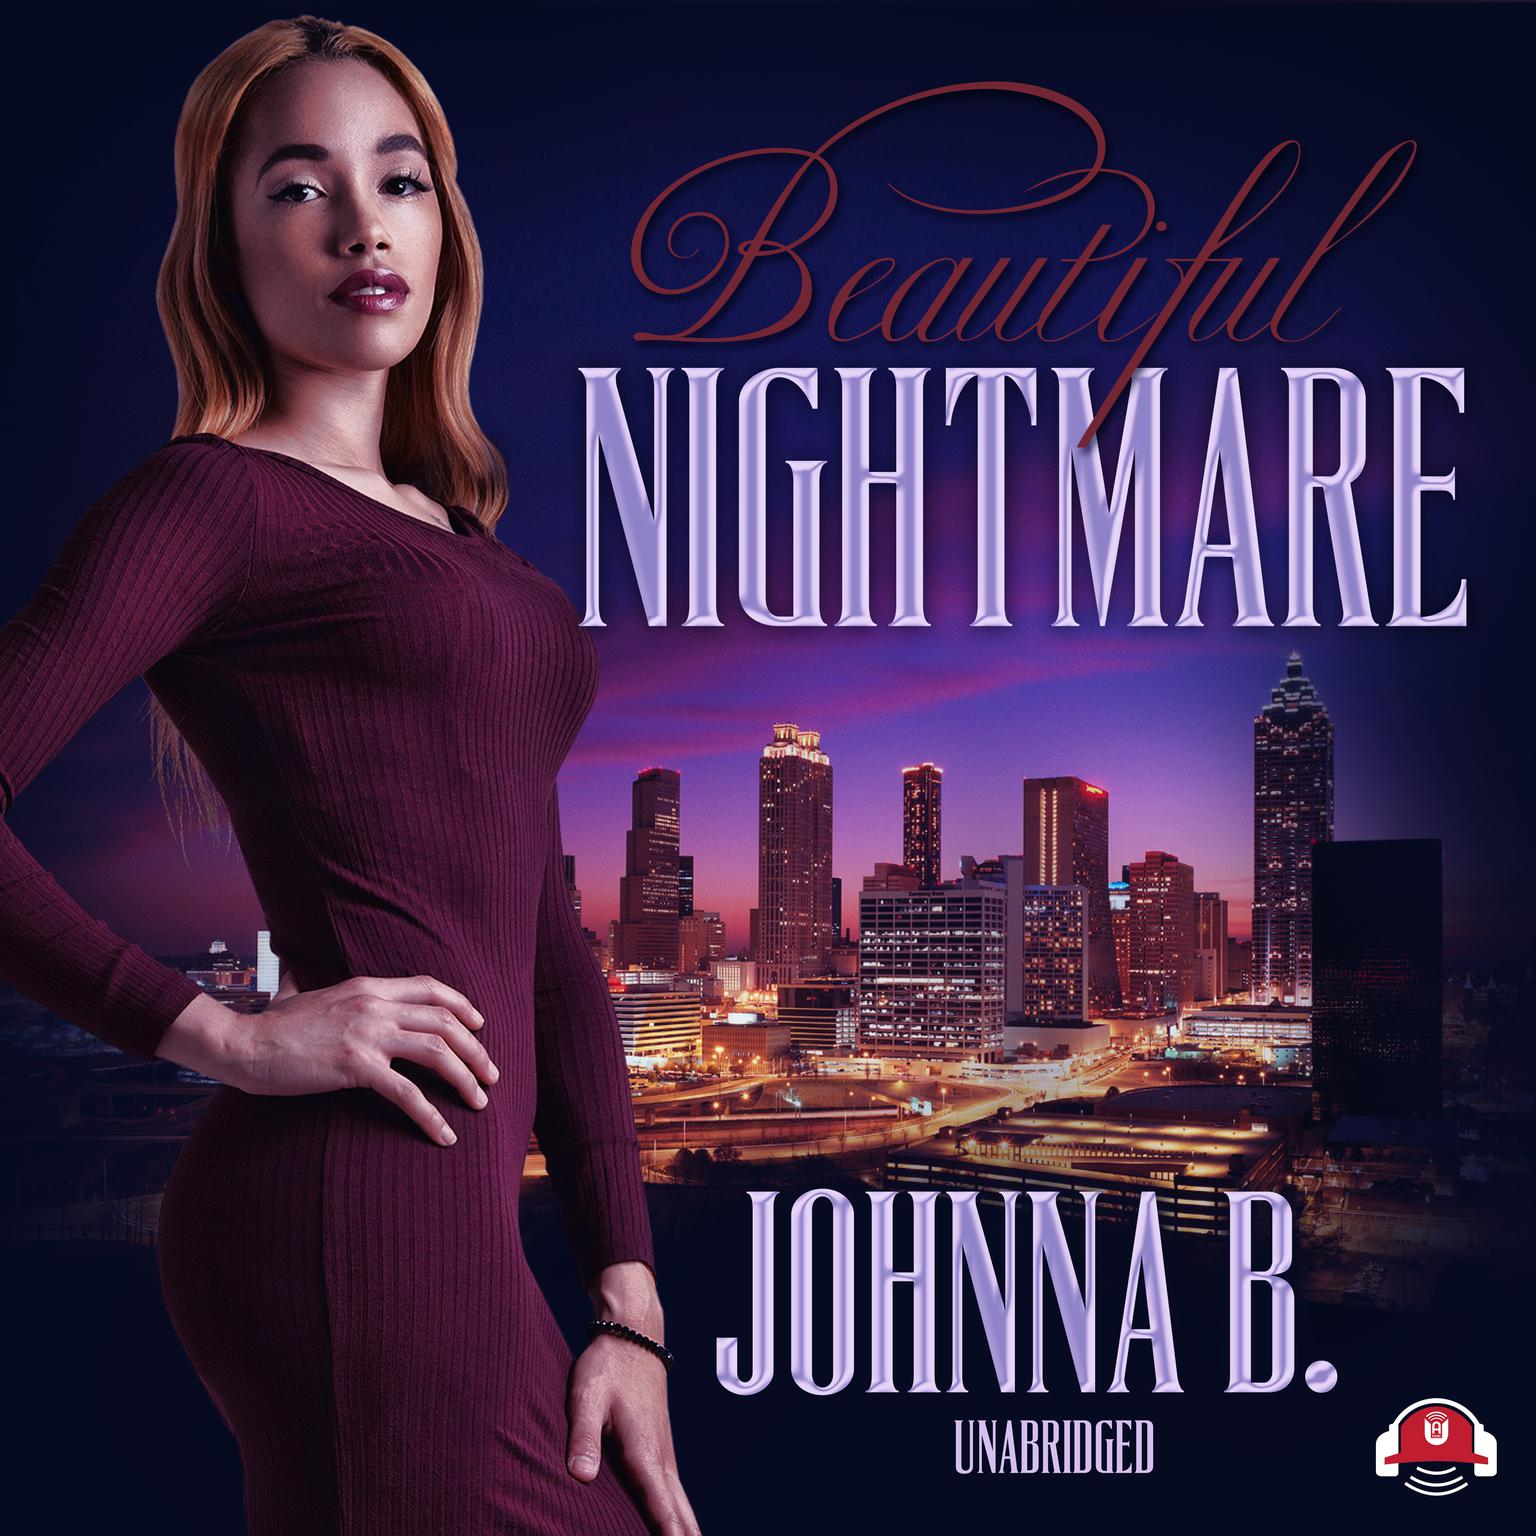 Beautiful Nightmare Audiobook, by Johnna B